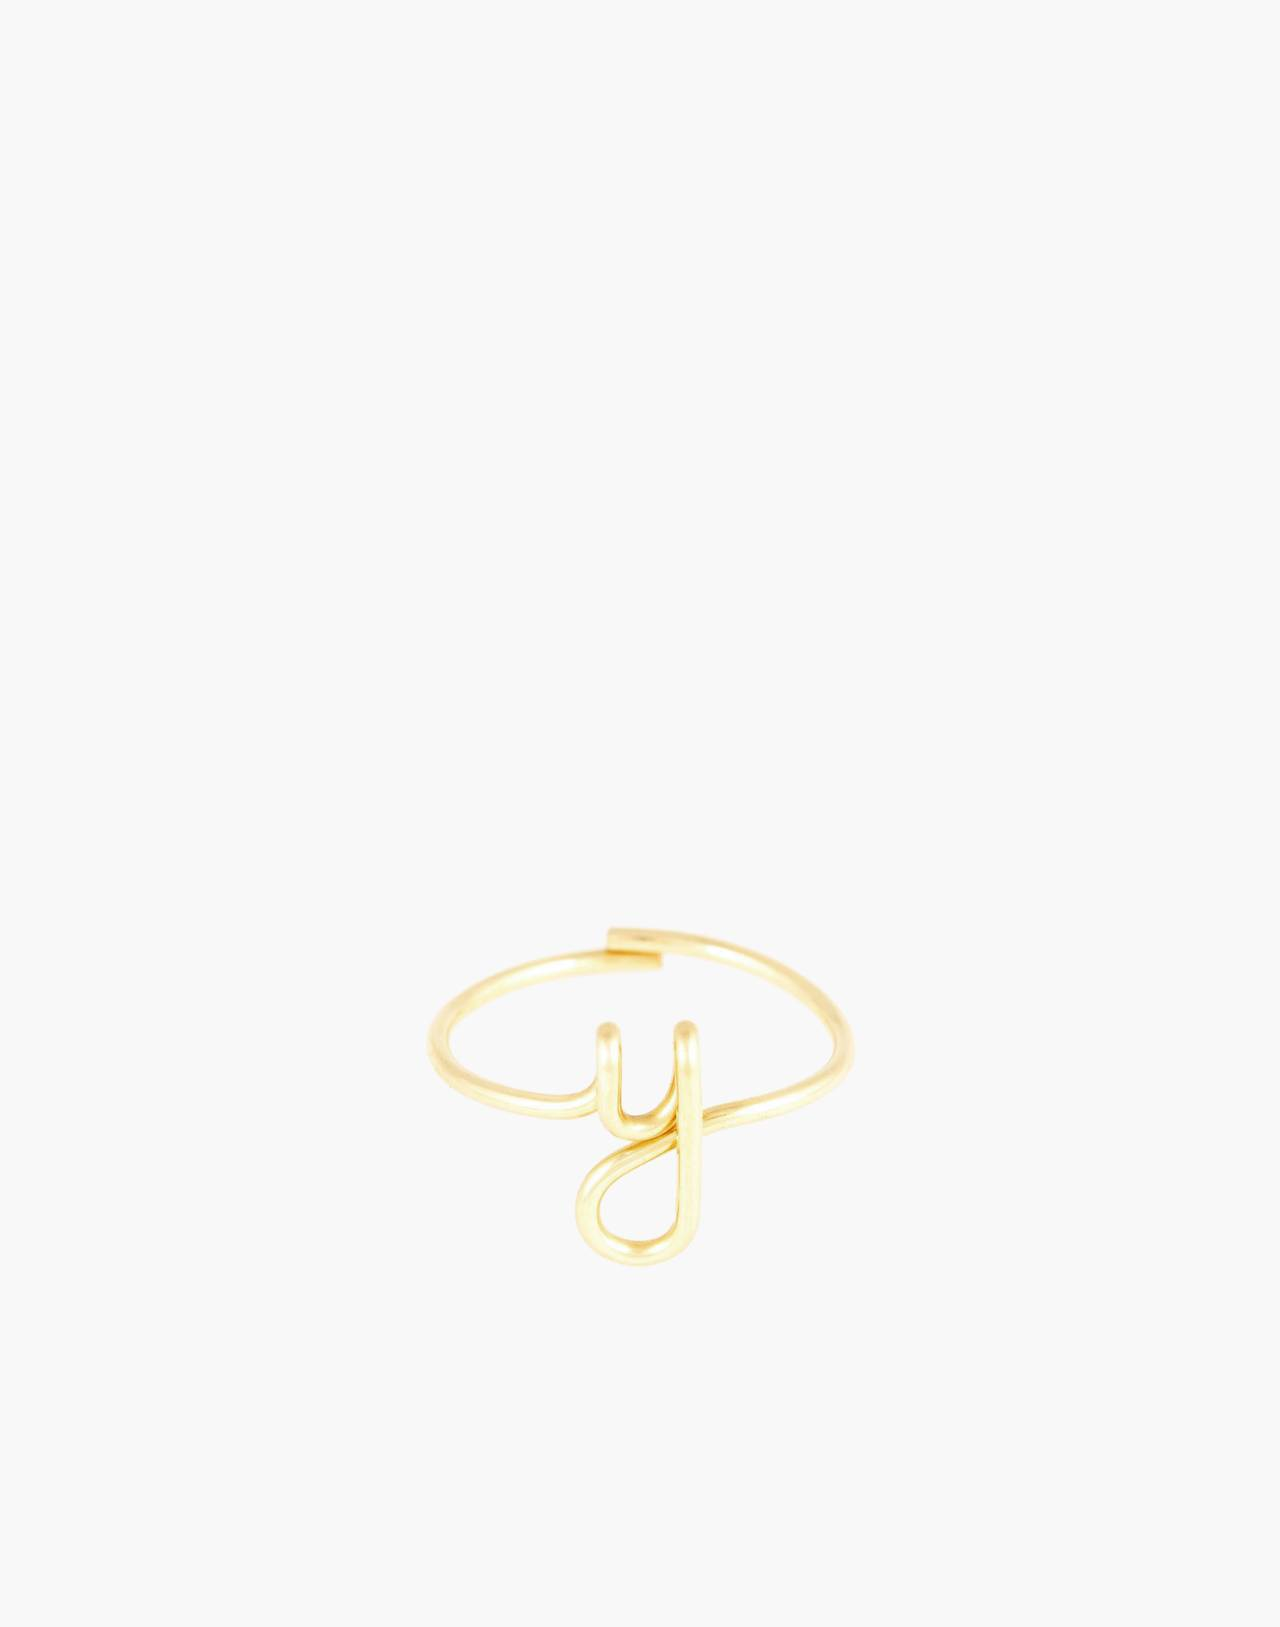 Atelier Paulin™ Poetic Letter Ring in letter y image 1